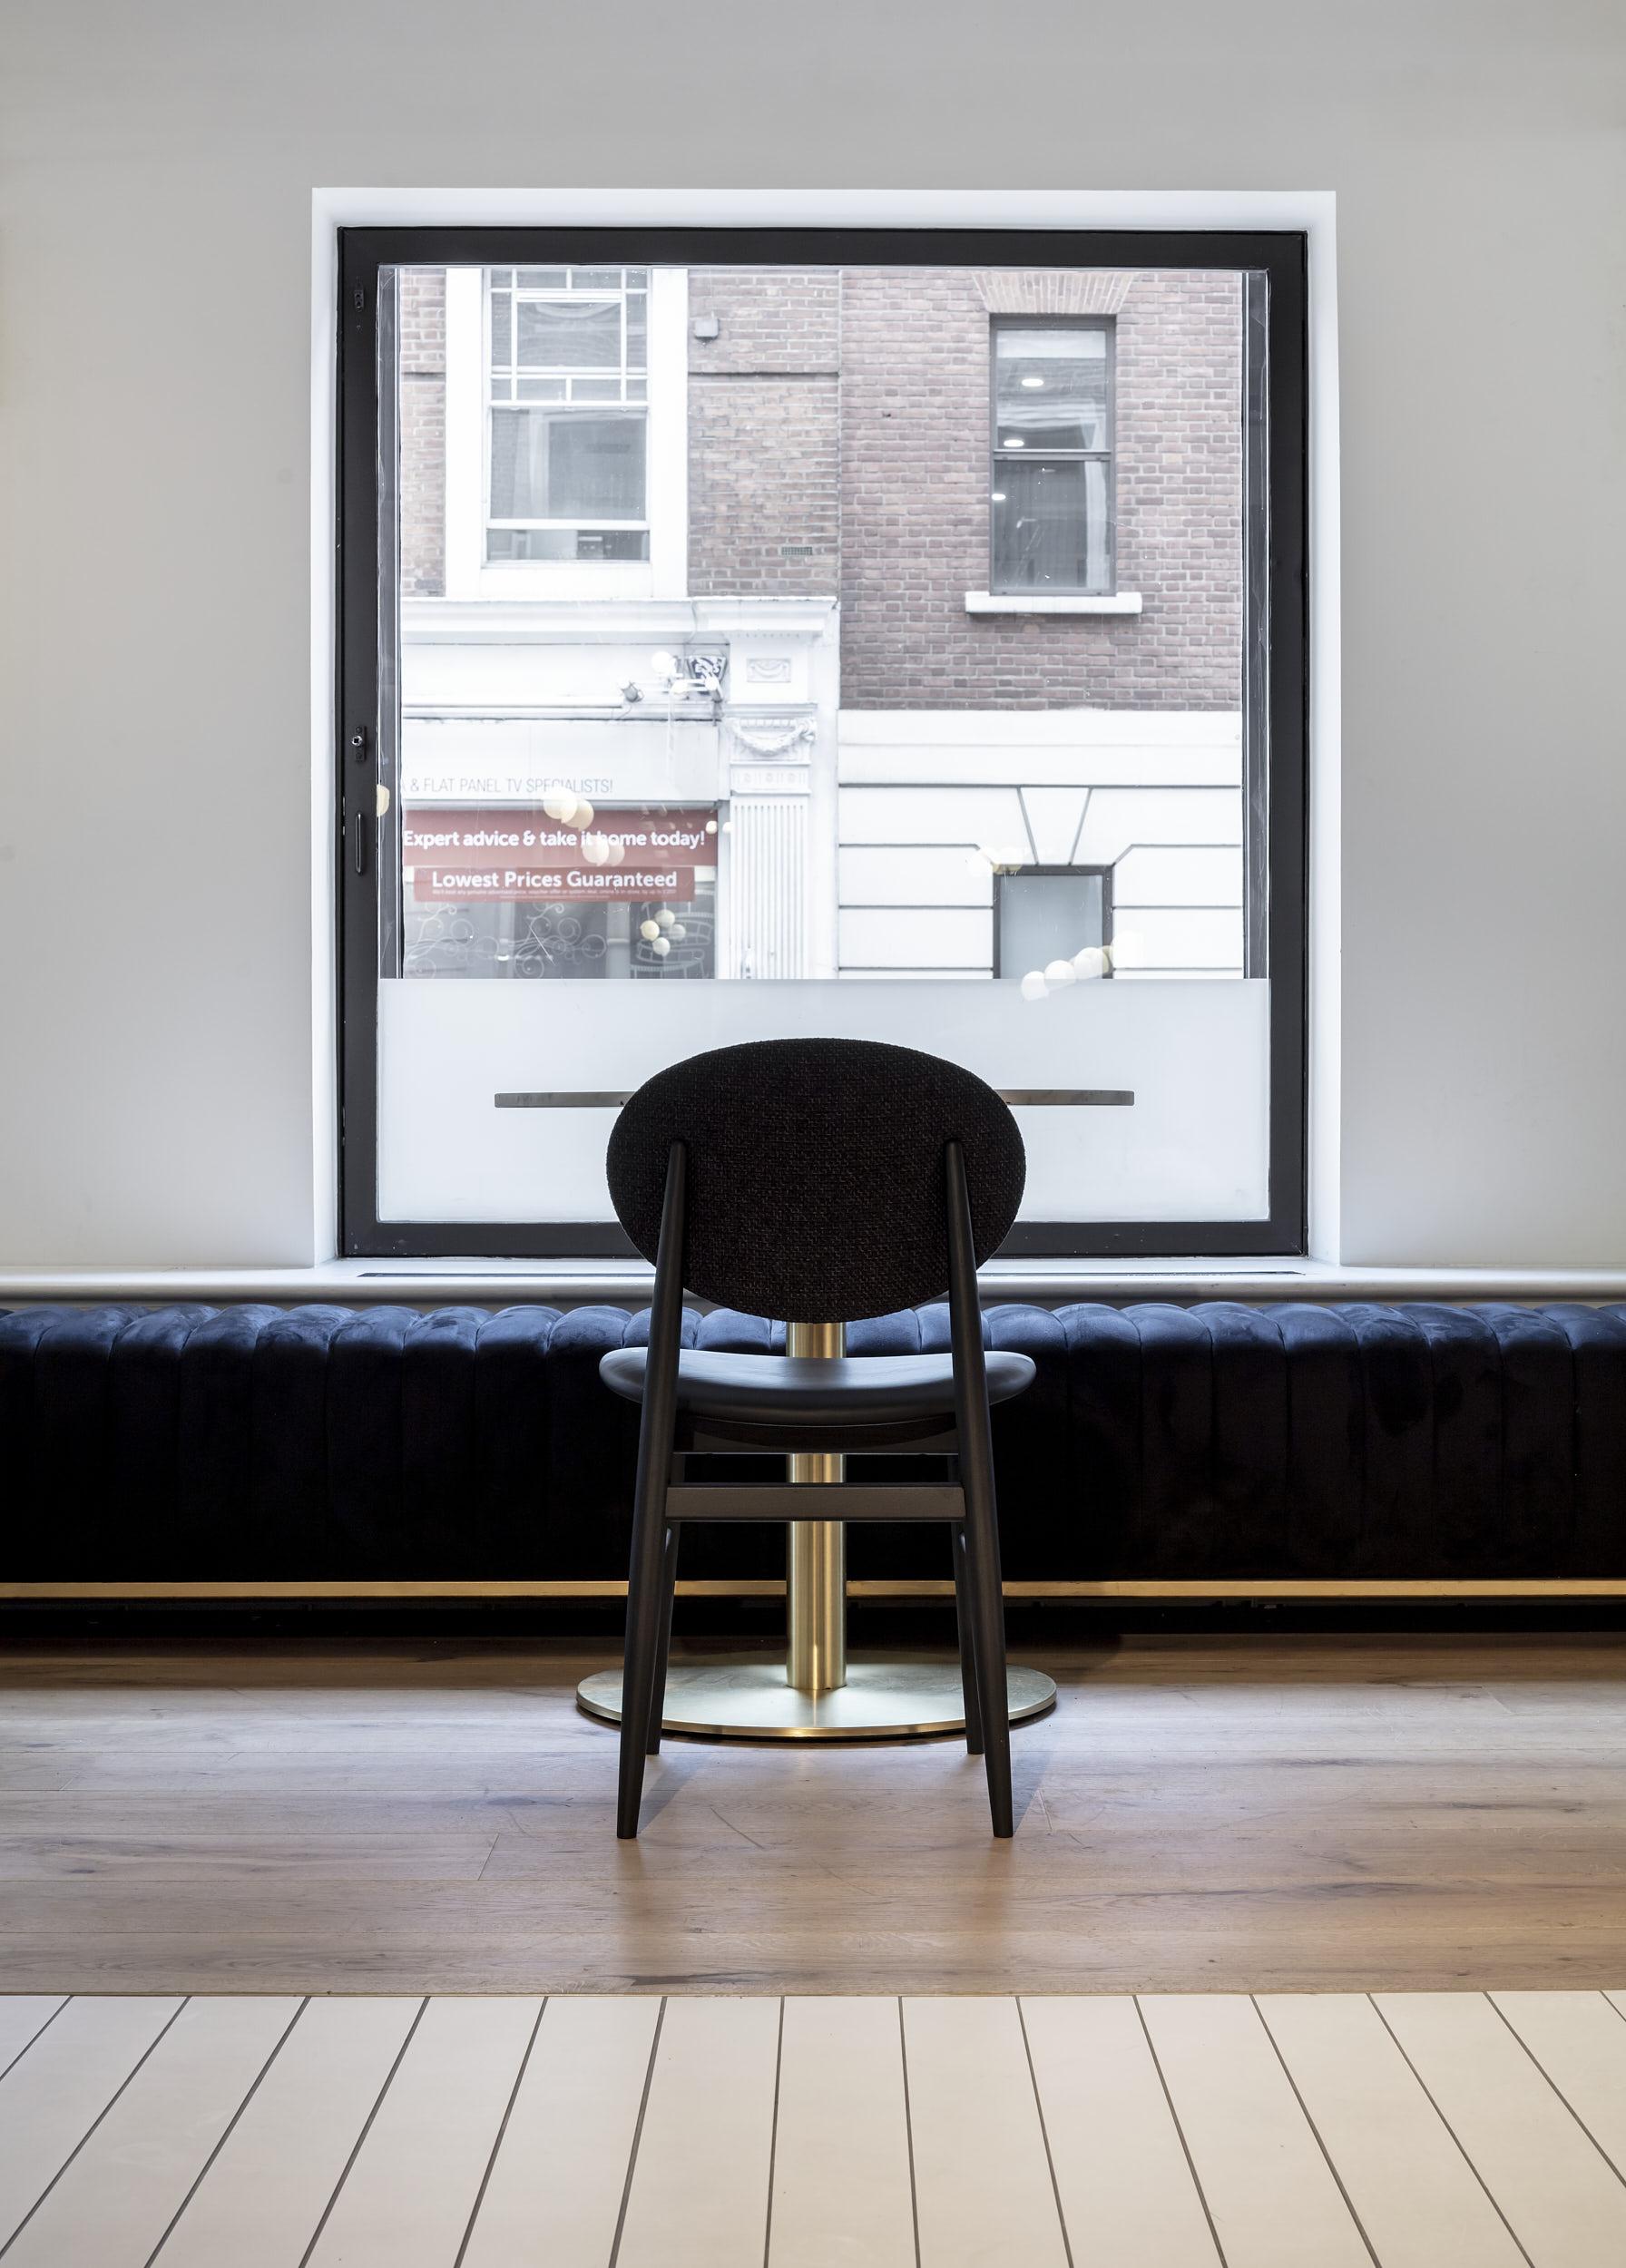 The interiors feature minimalist design and beautiful furniture.